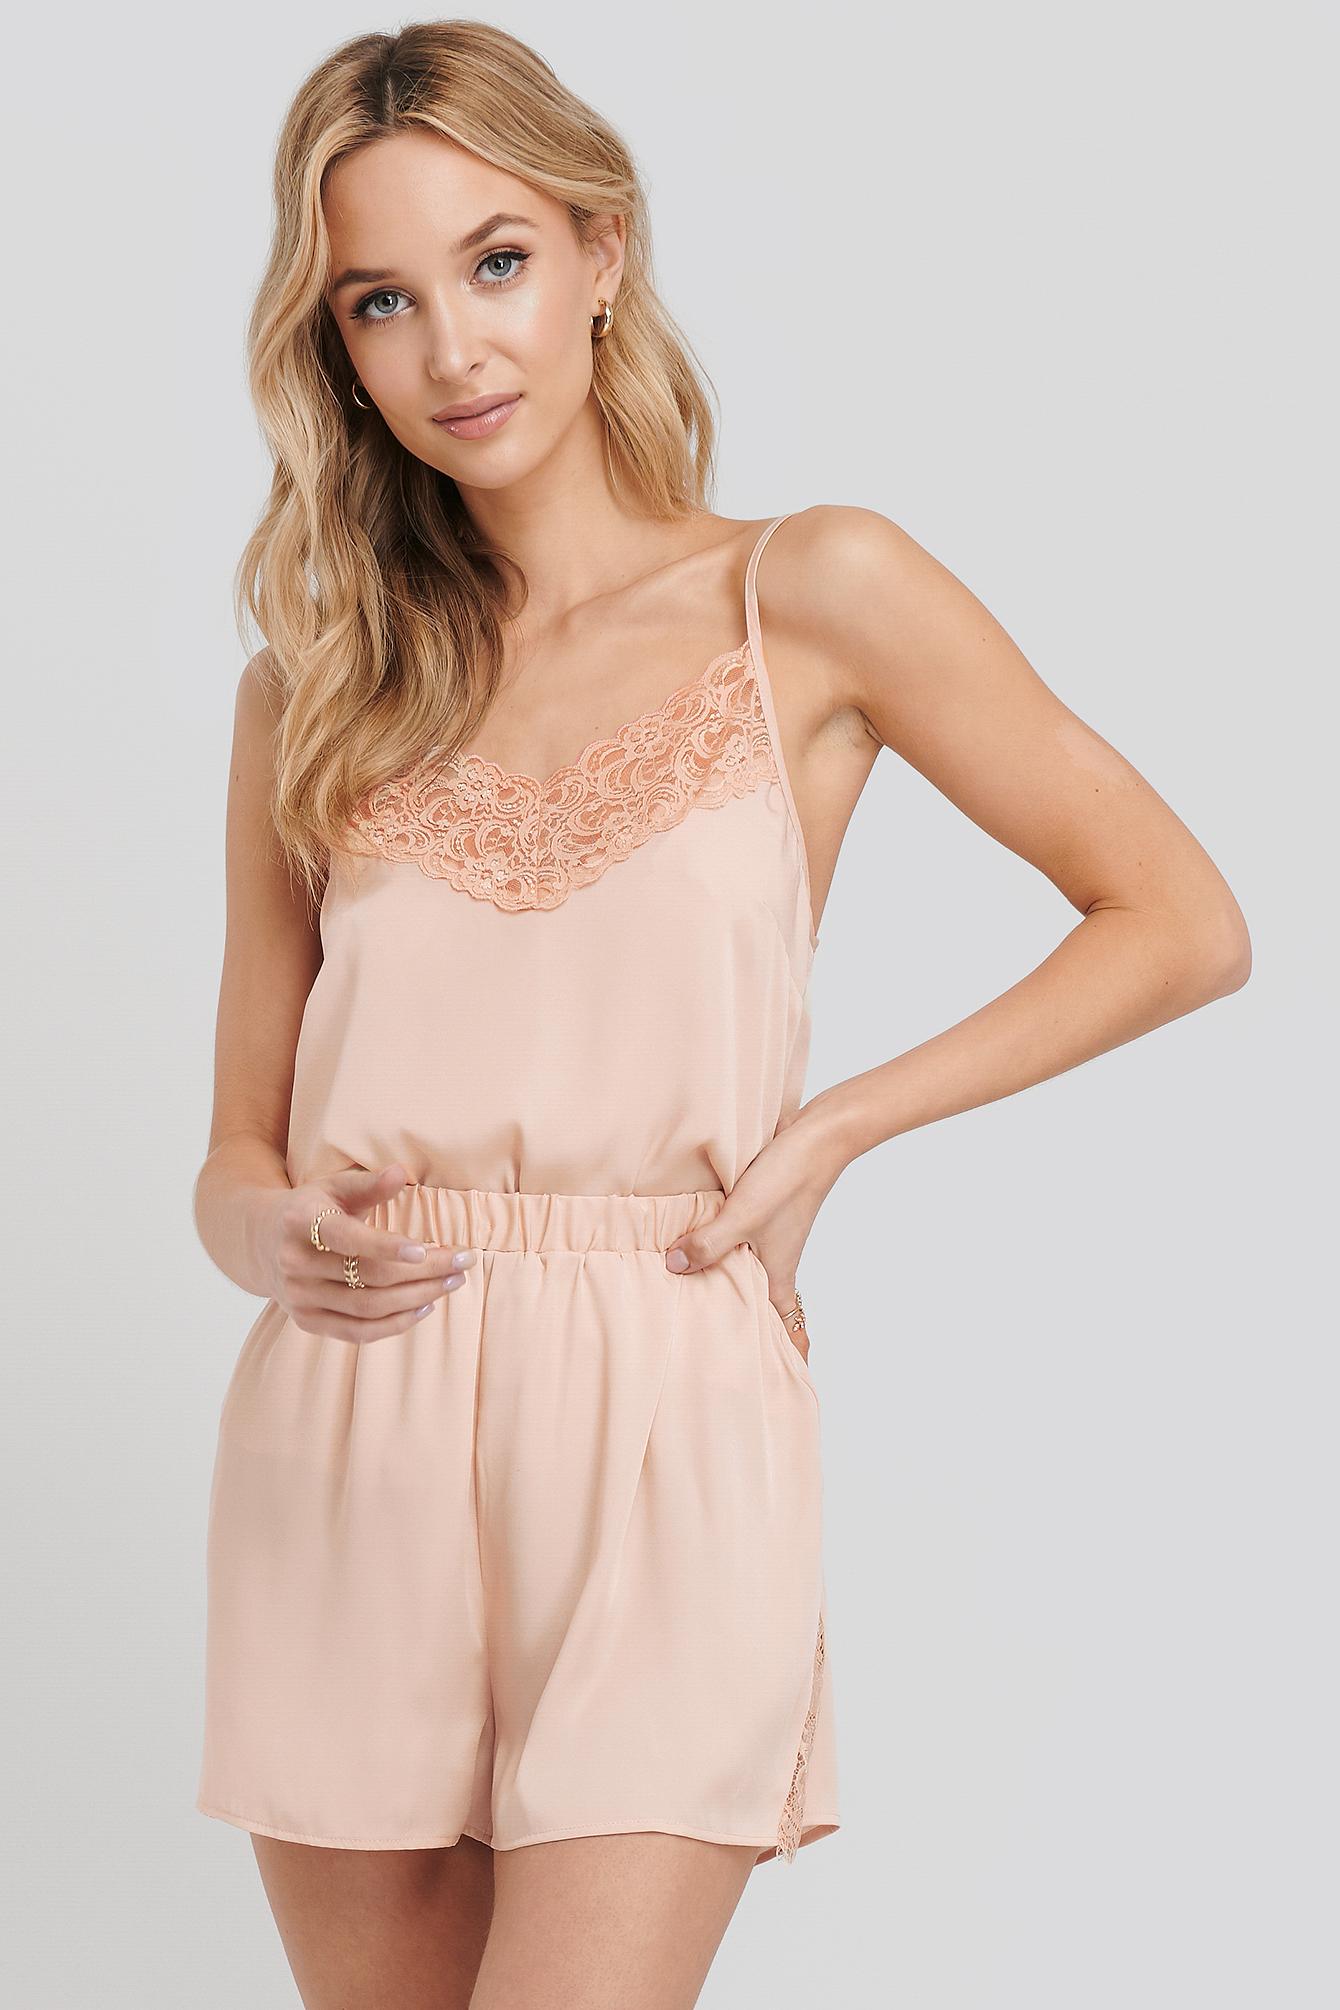 na-kd lingerie -  Lace Edge Night Satin Shorts - Pink